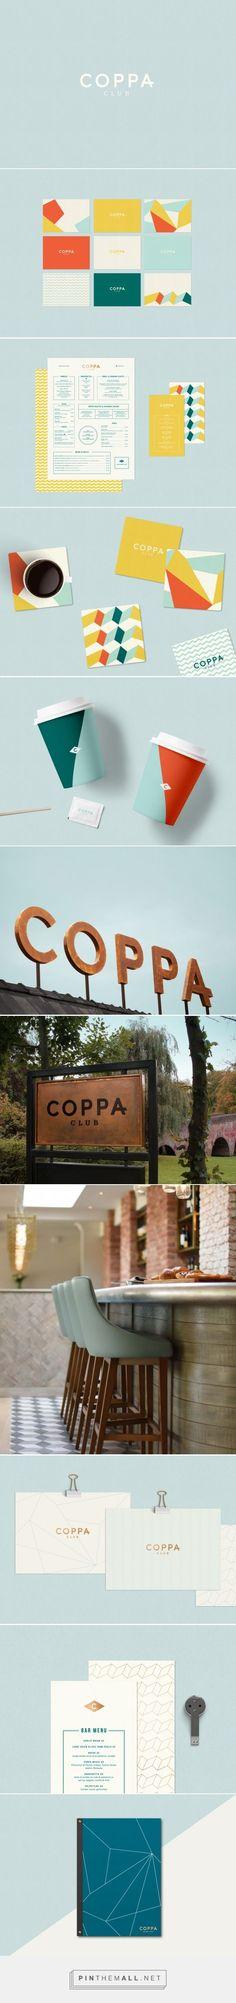 Coppa Club Branding by The Plant | Fivestar Branding – Design and Branding Agency & Inspiration Gallery #brandidentitydesign